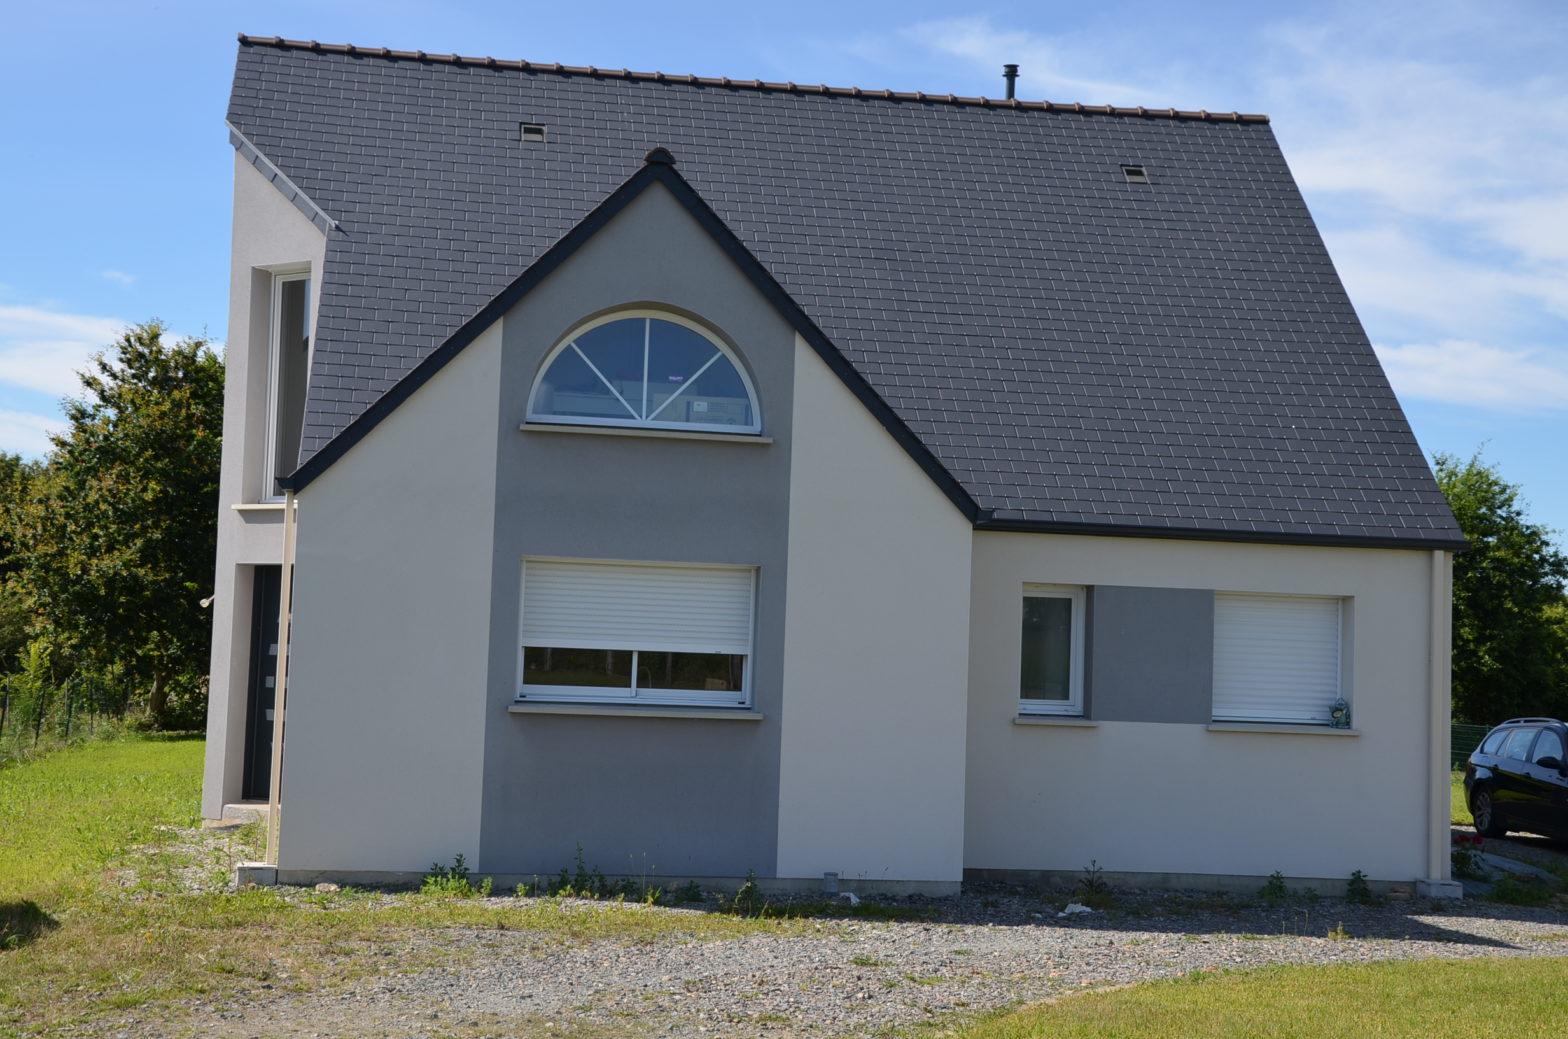 maison etage r+1 toiture monopente 49 tierce